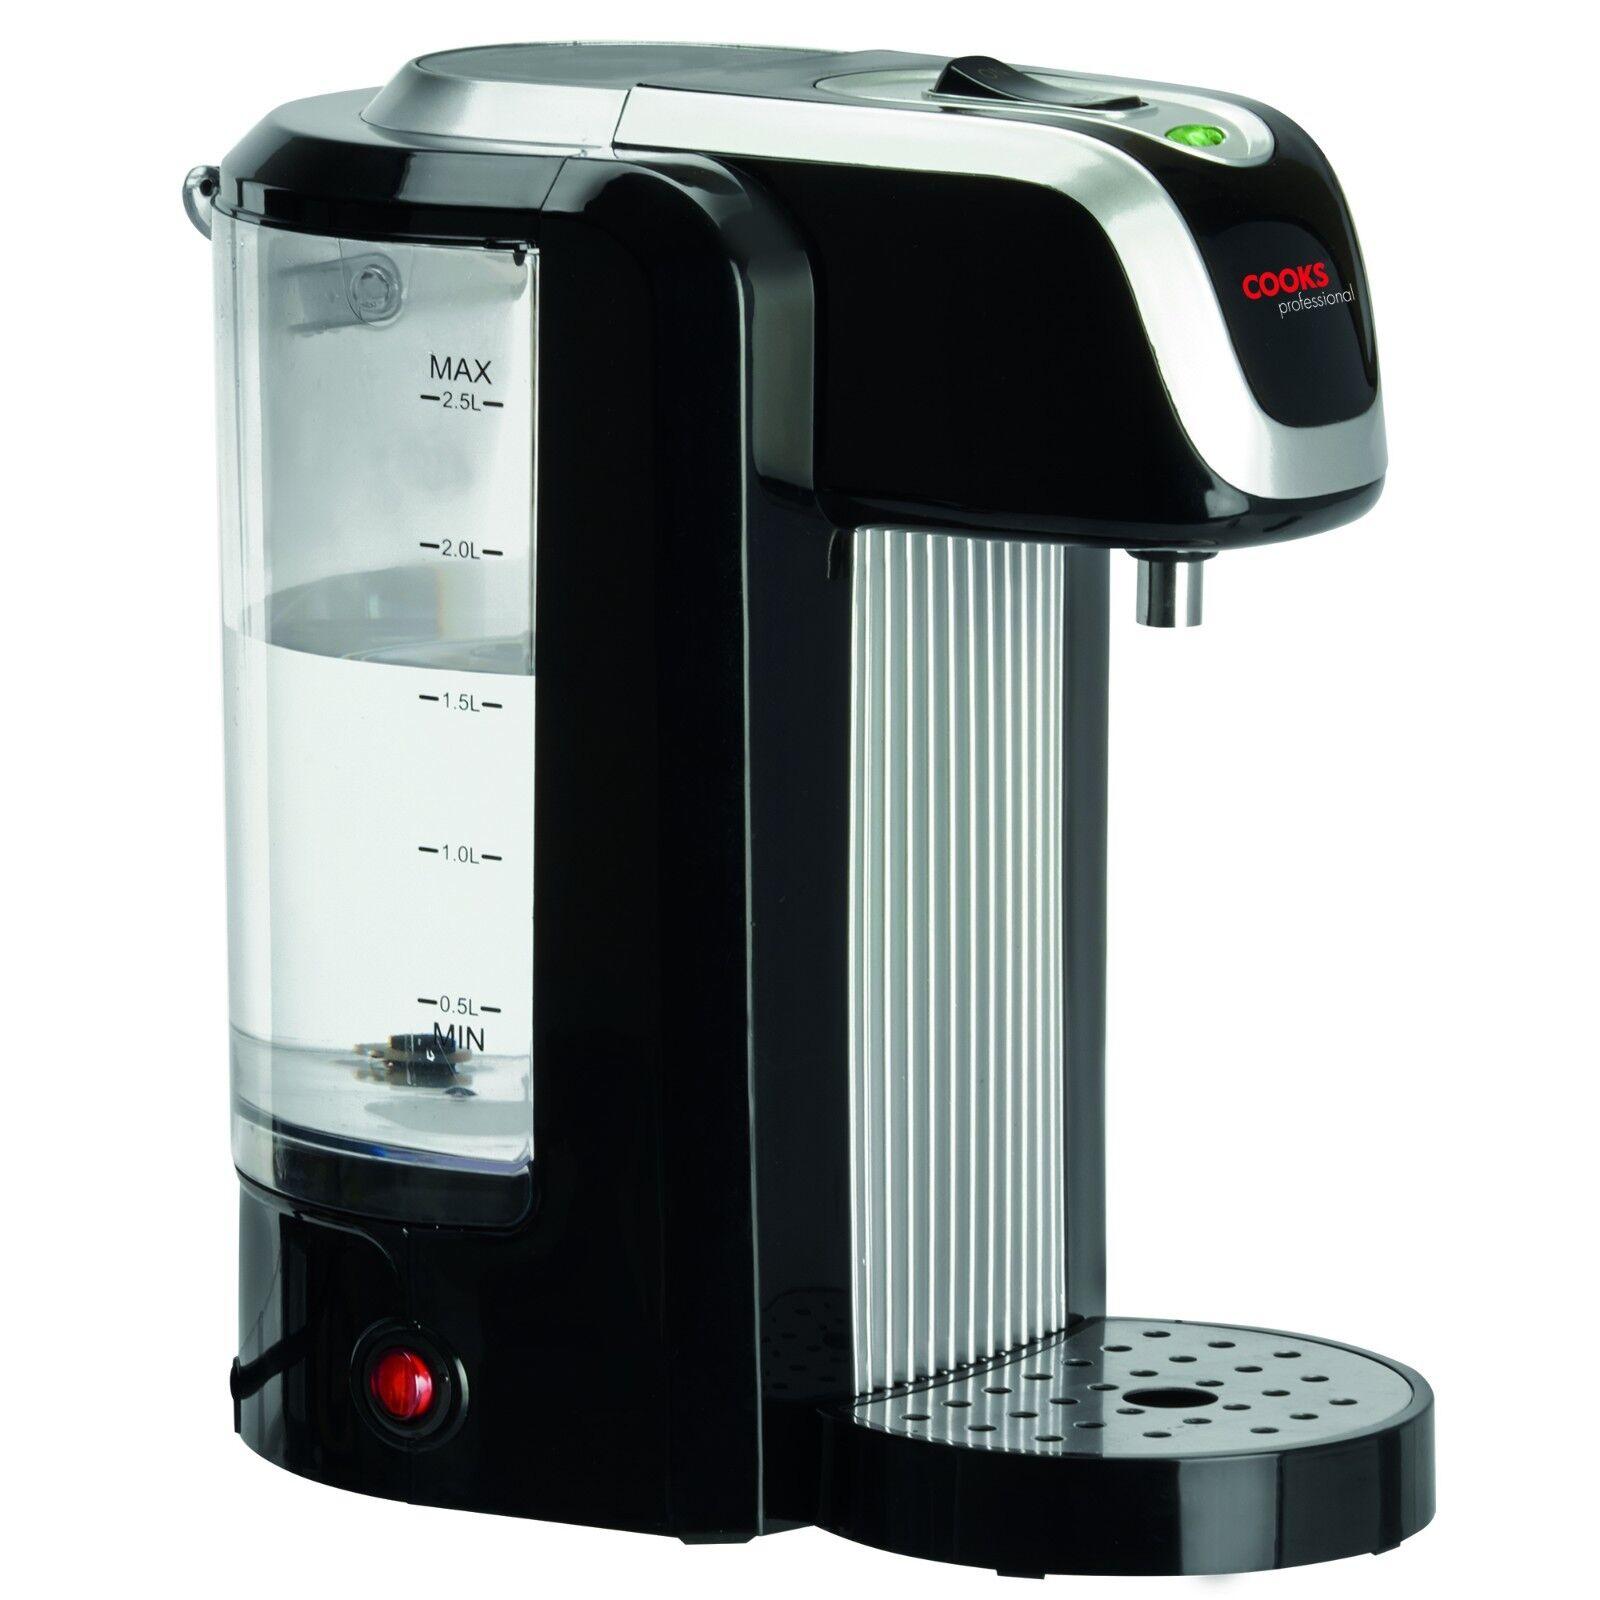 Instant Hot Water Dispenser & Boiler Machine 2600W 2.5L Rapid Boil ...